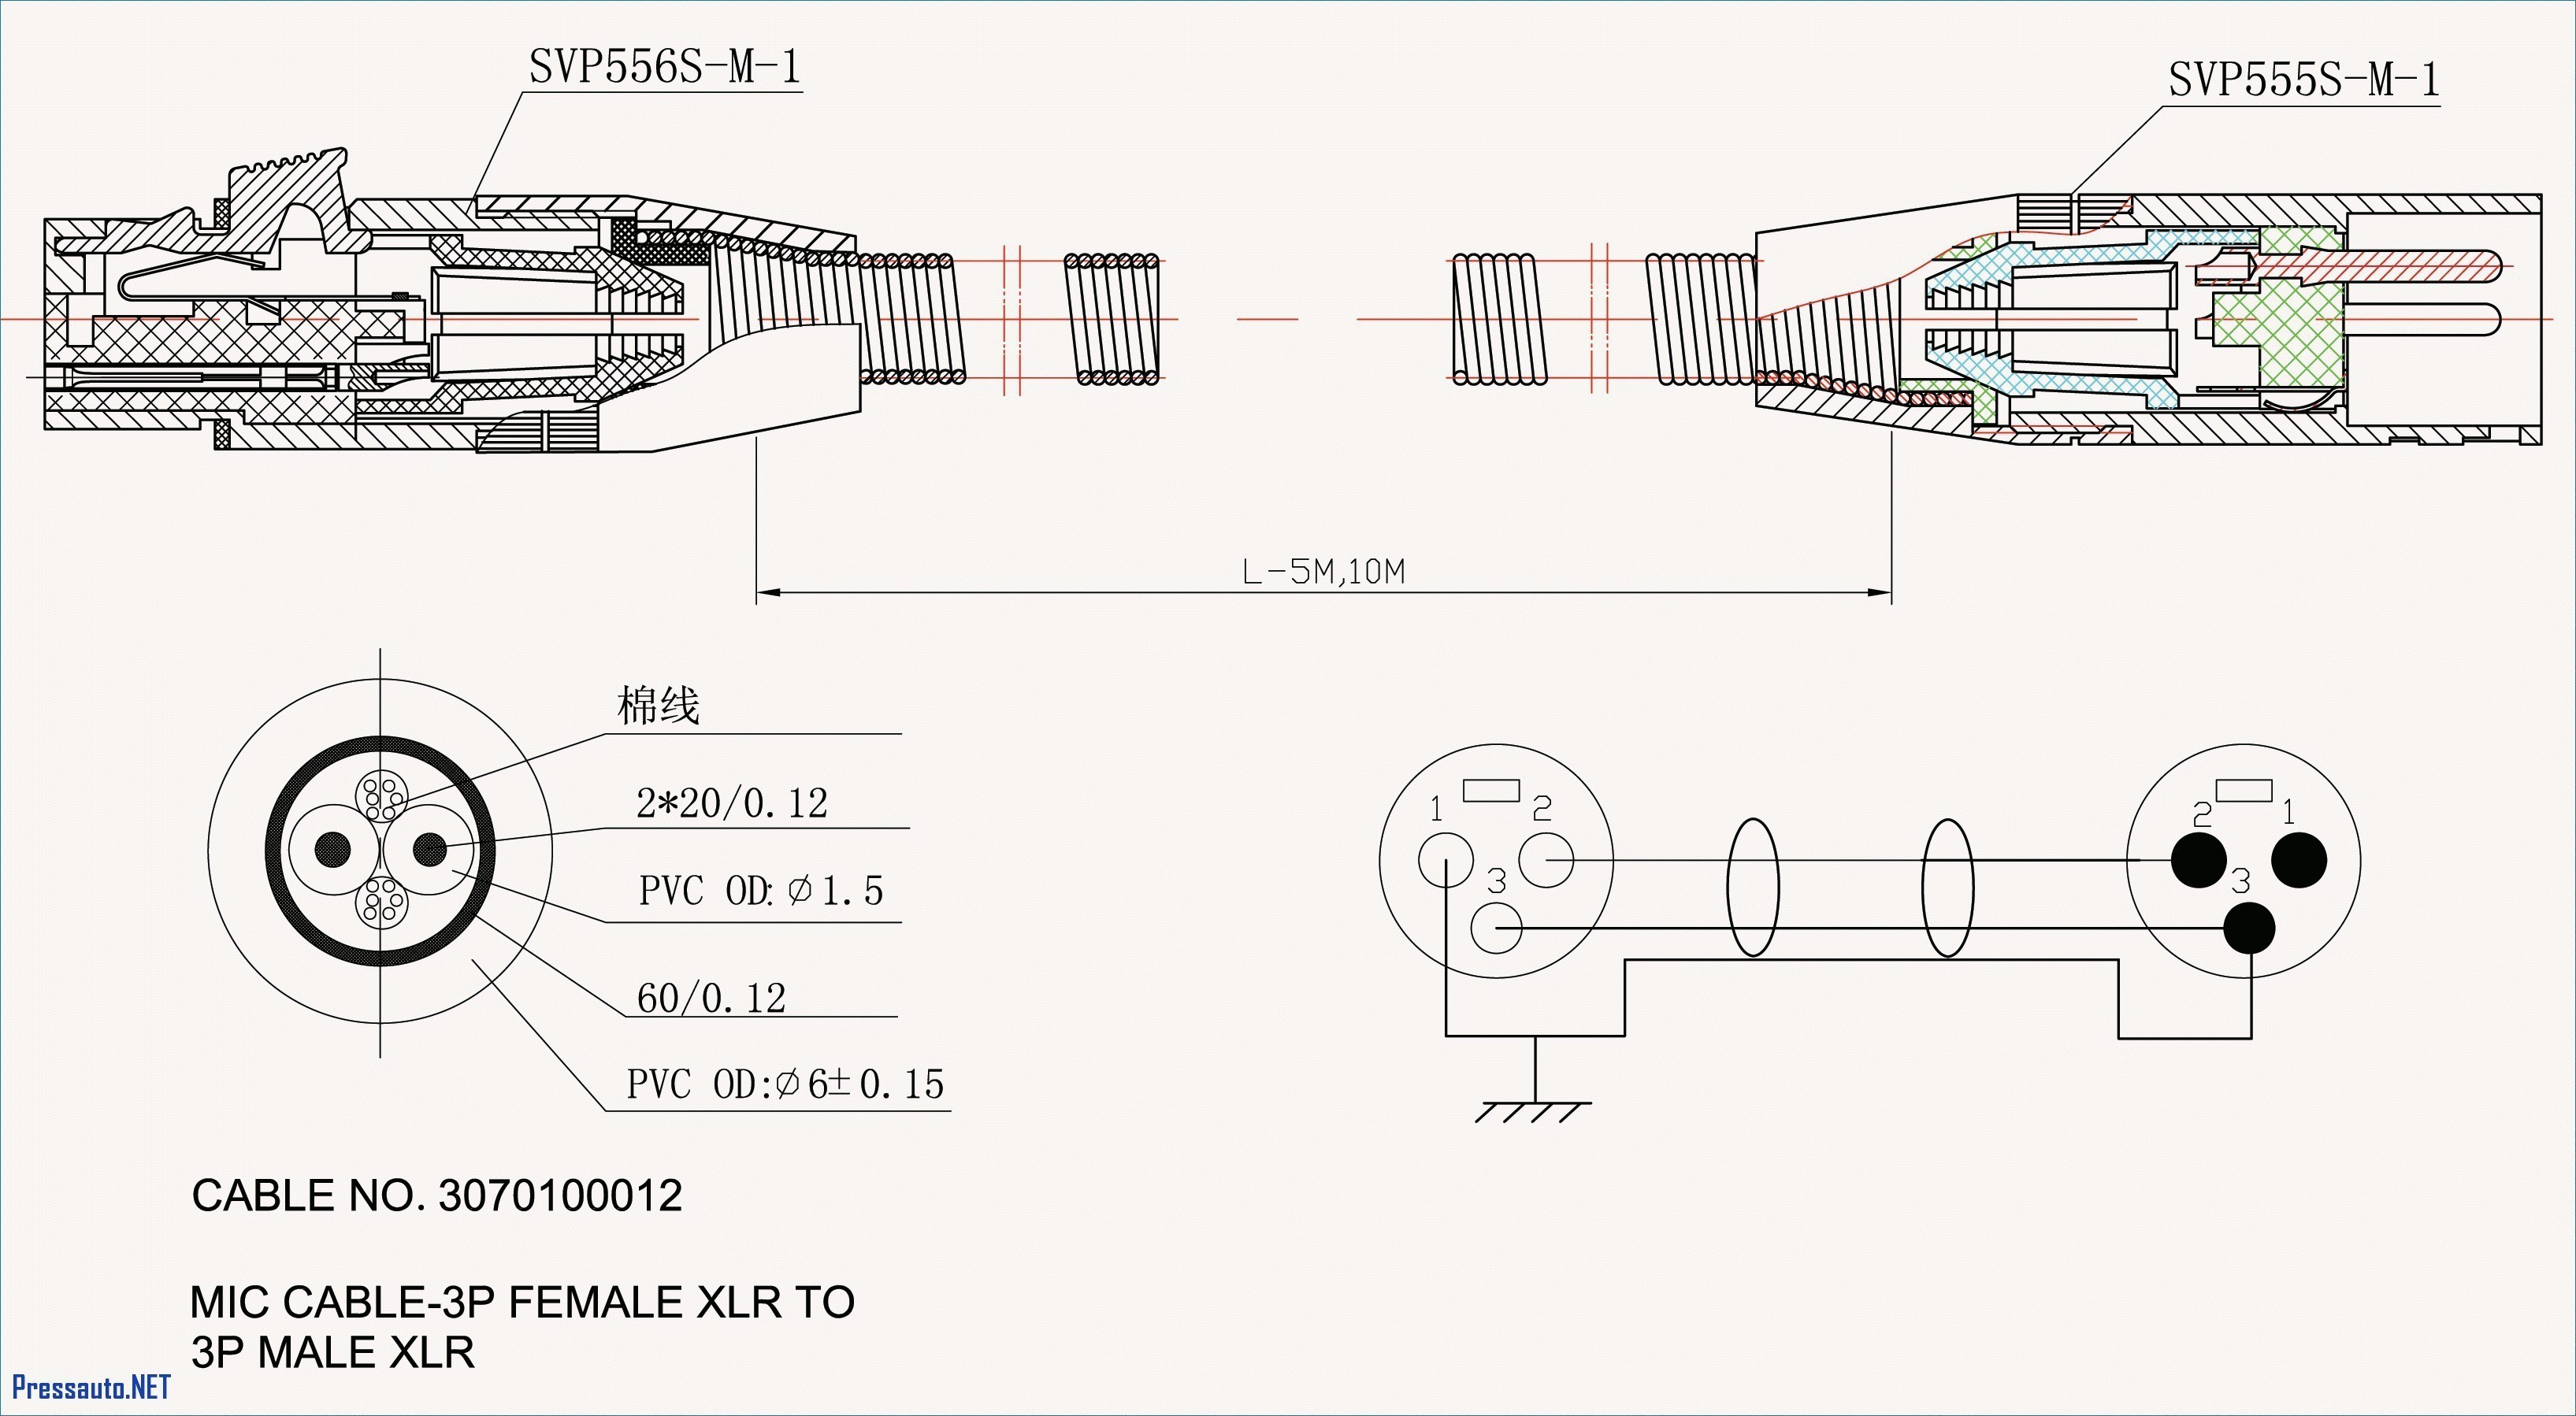 1996 Jeep Grand Cherokee Engine Diagram 27dd7d Wire Diagram Allis Chalmers B12 Of 1996 Jeep Grand Cherokee Engine Diagram